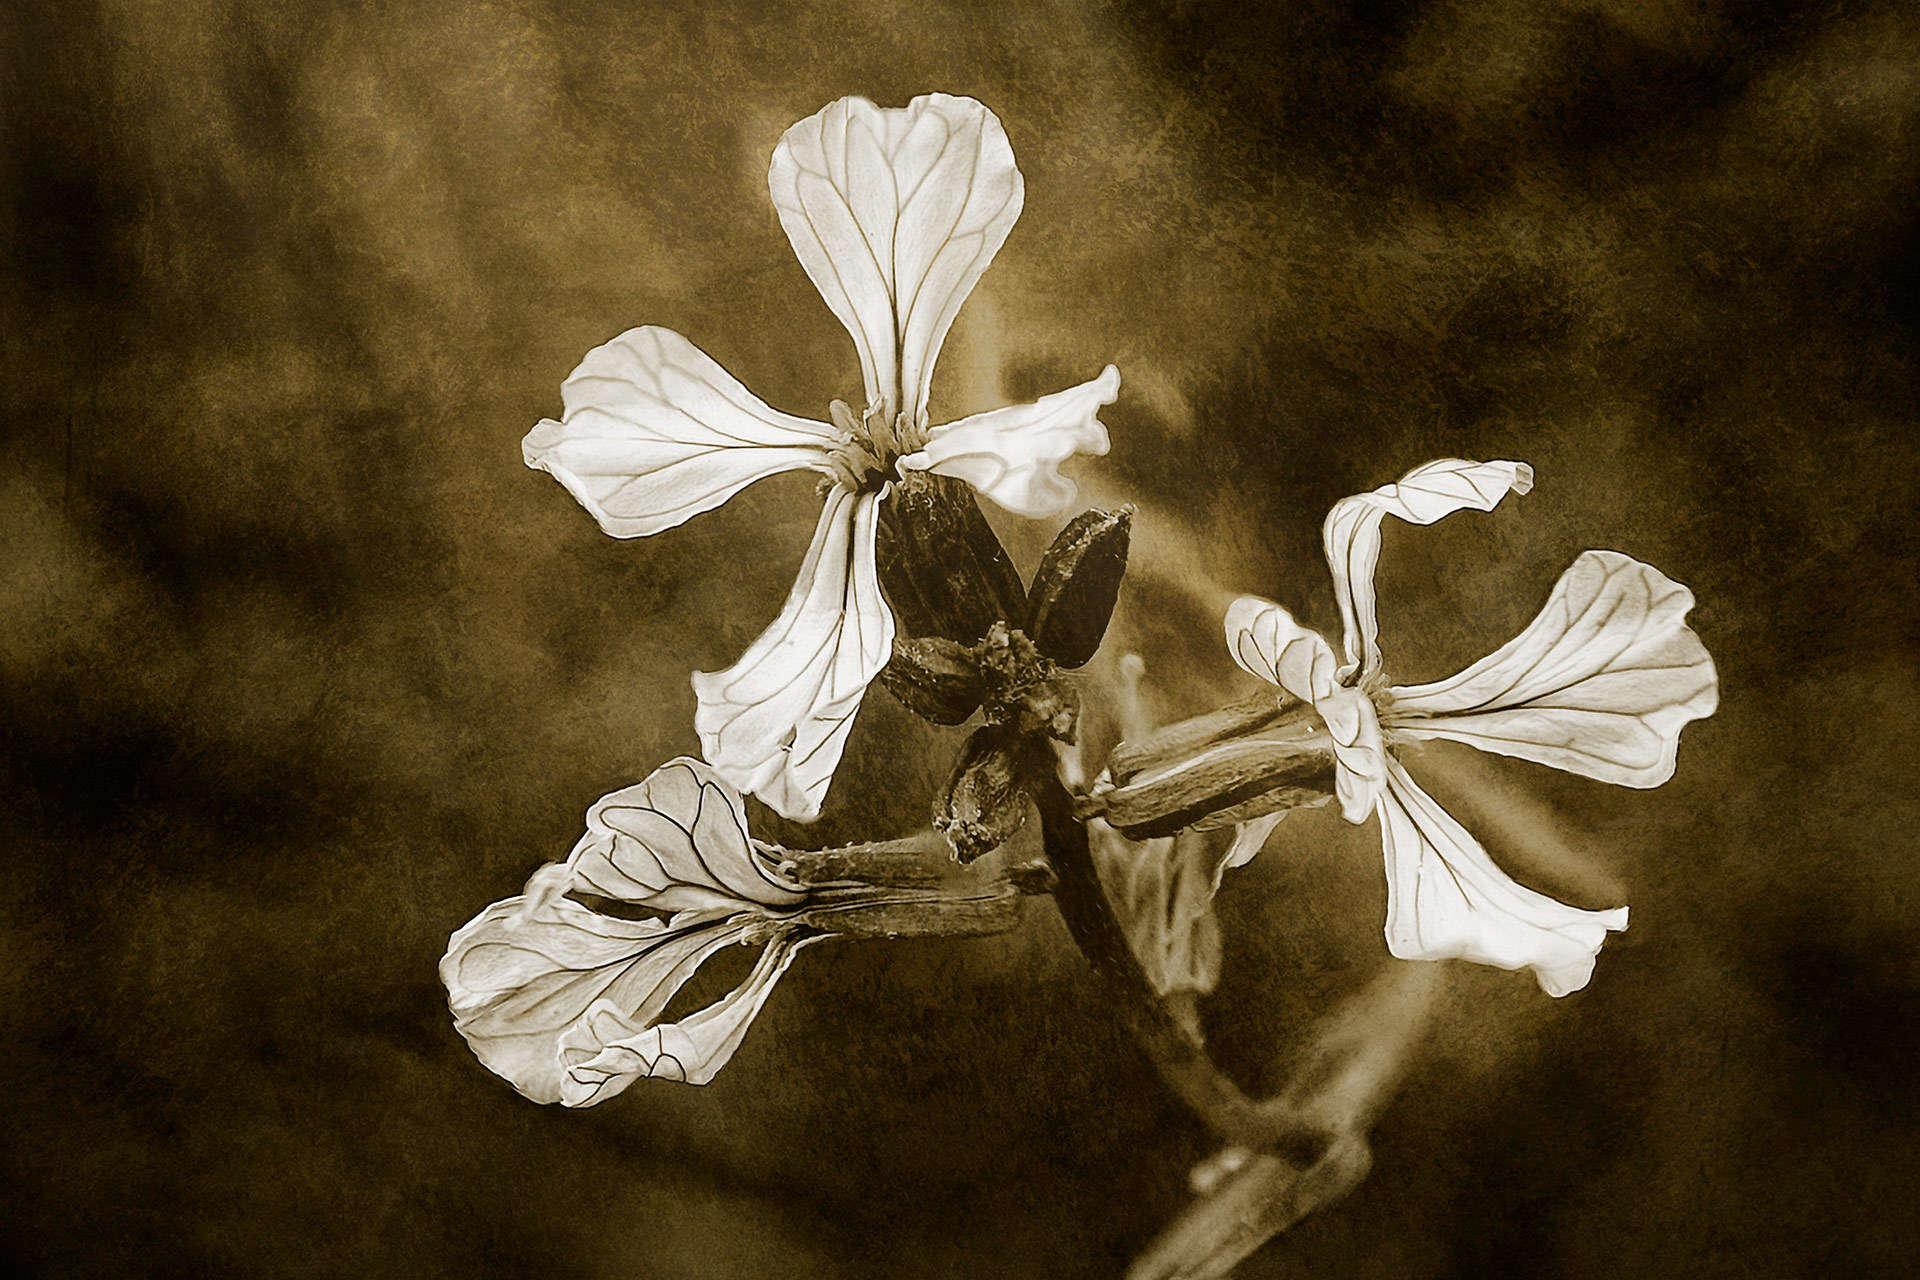 The Last Flowers of Autumn